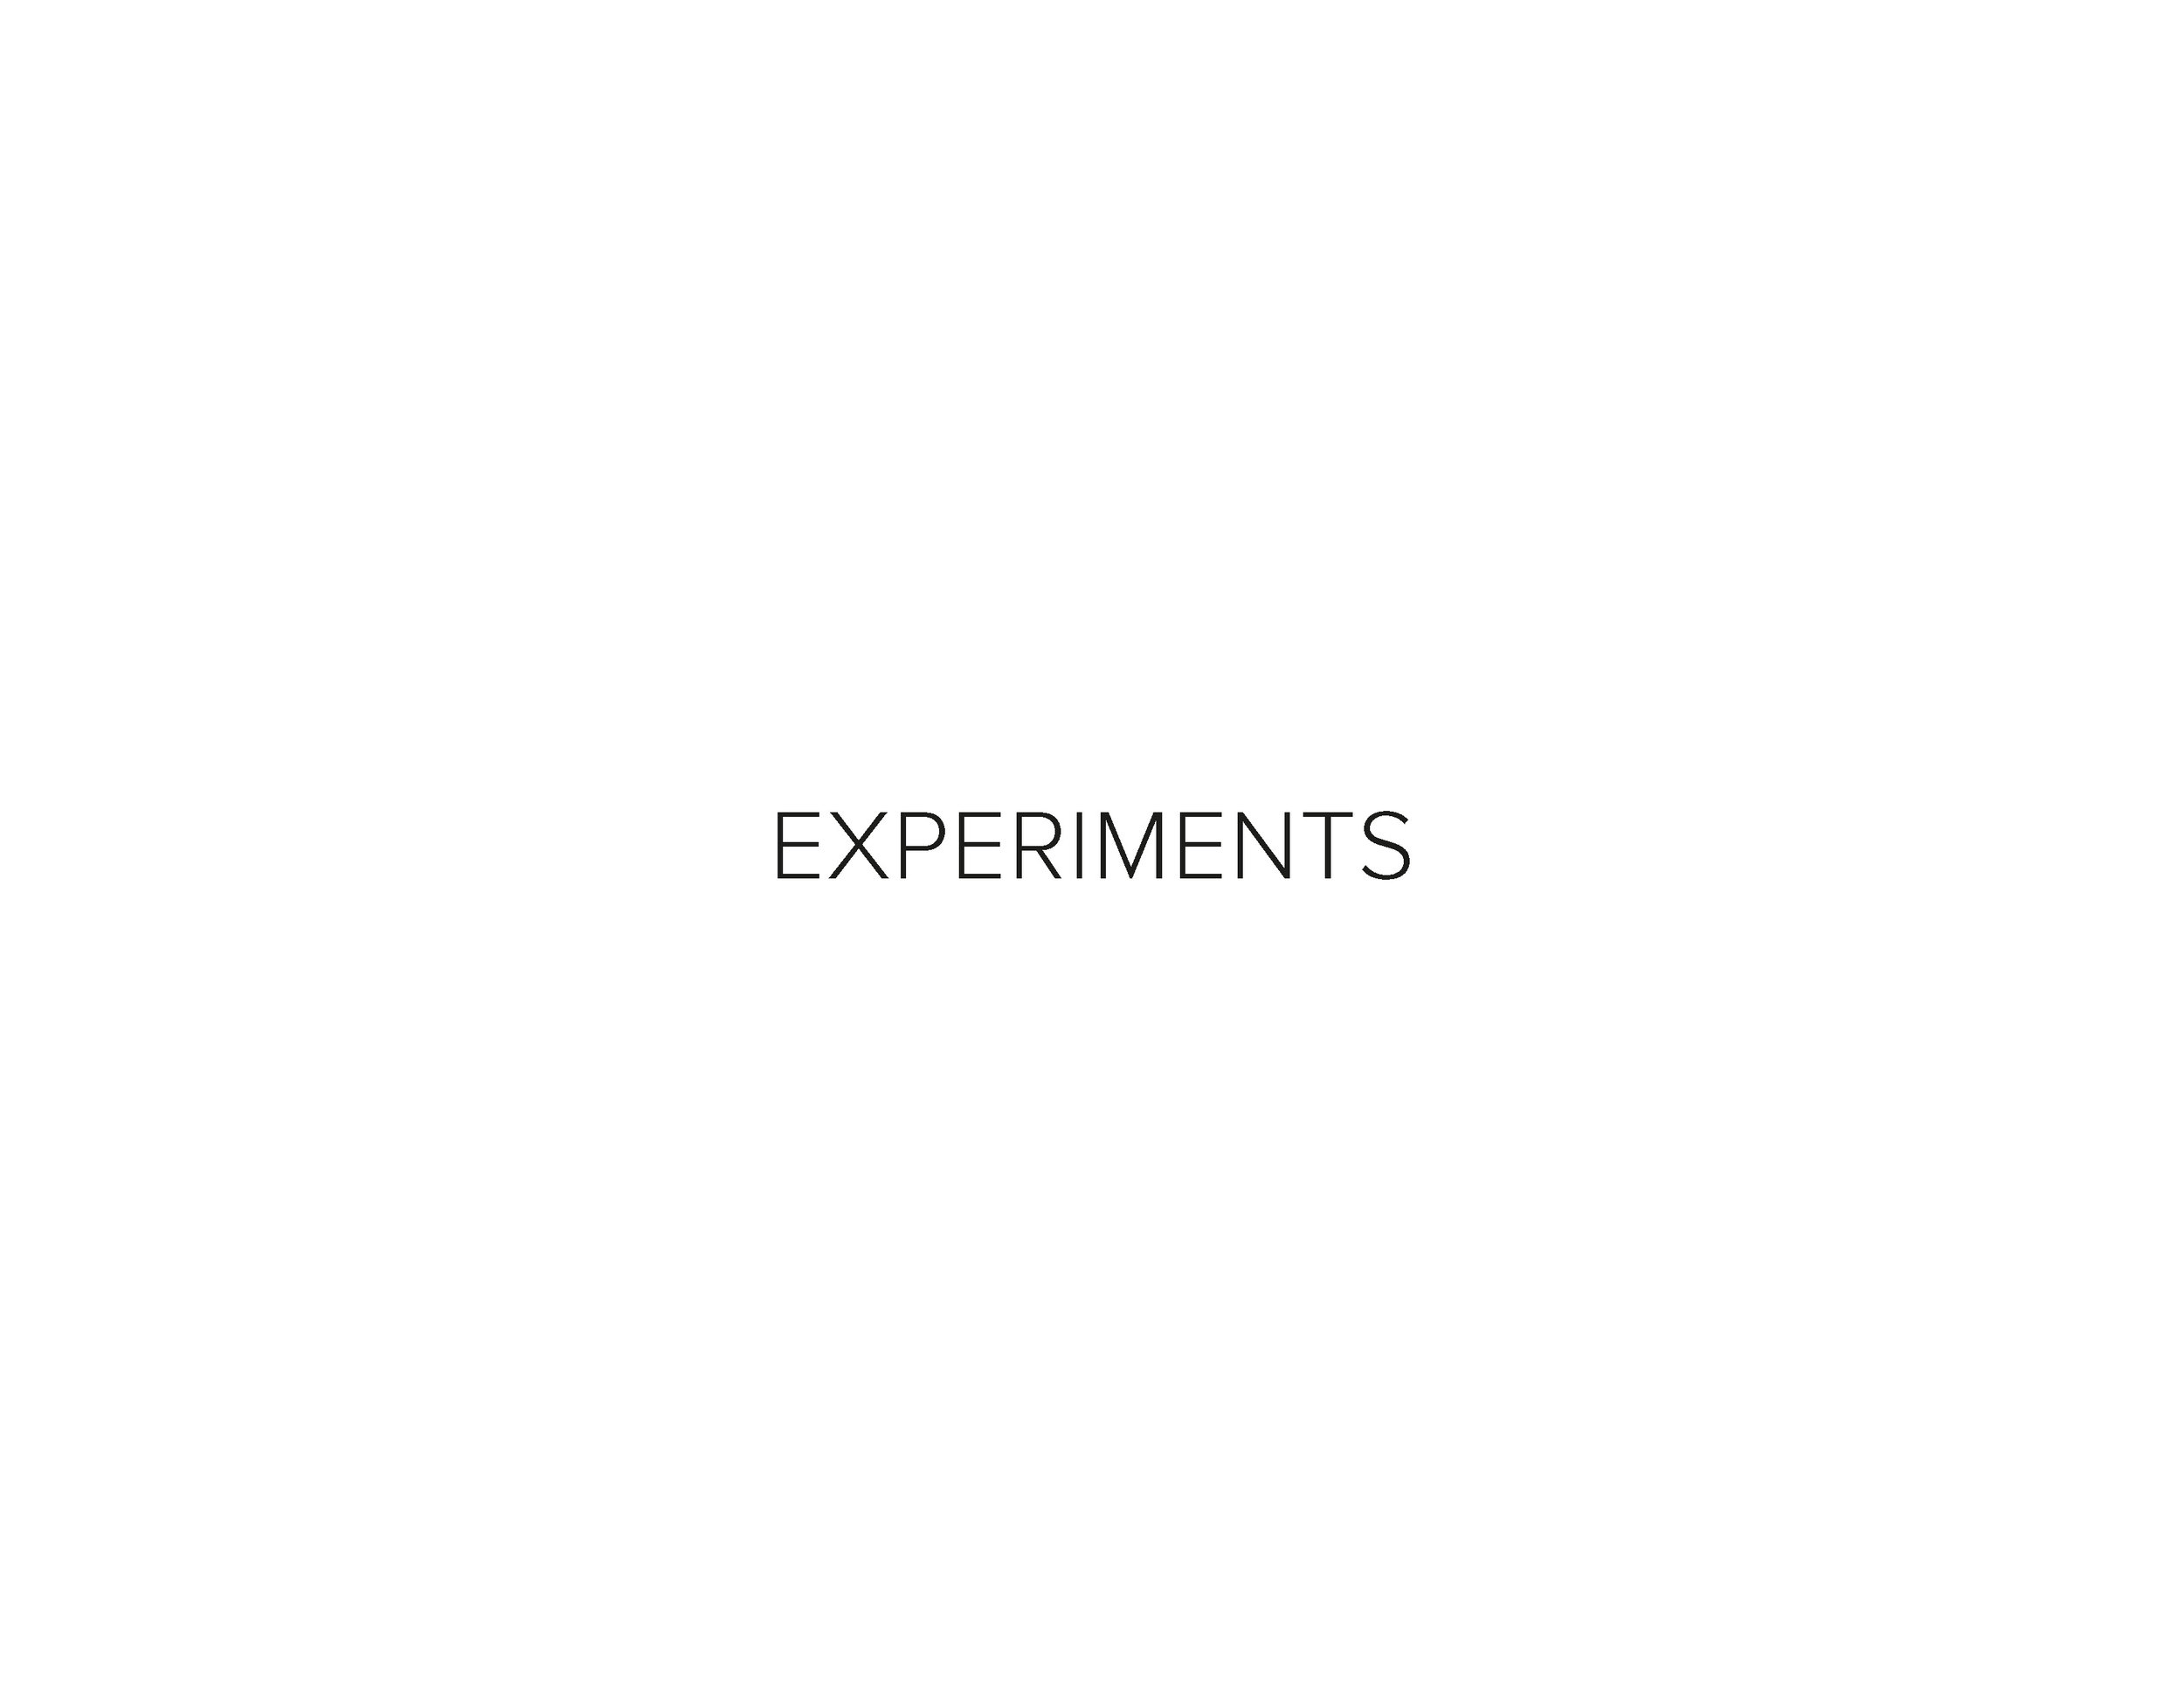 AAnt18_Salt Group_pdfpresentation_final_Page_36.jpg